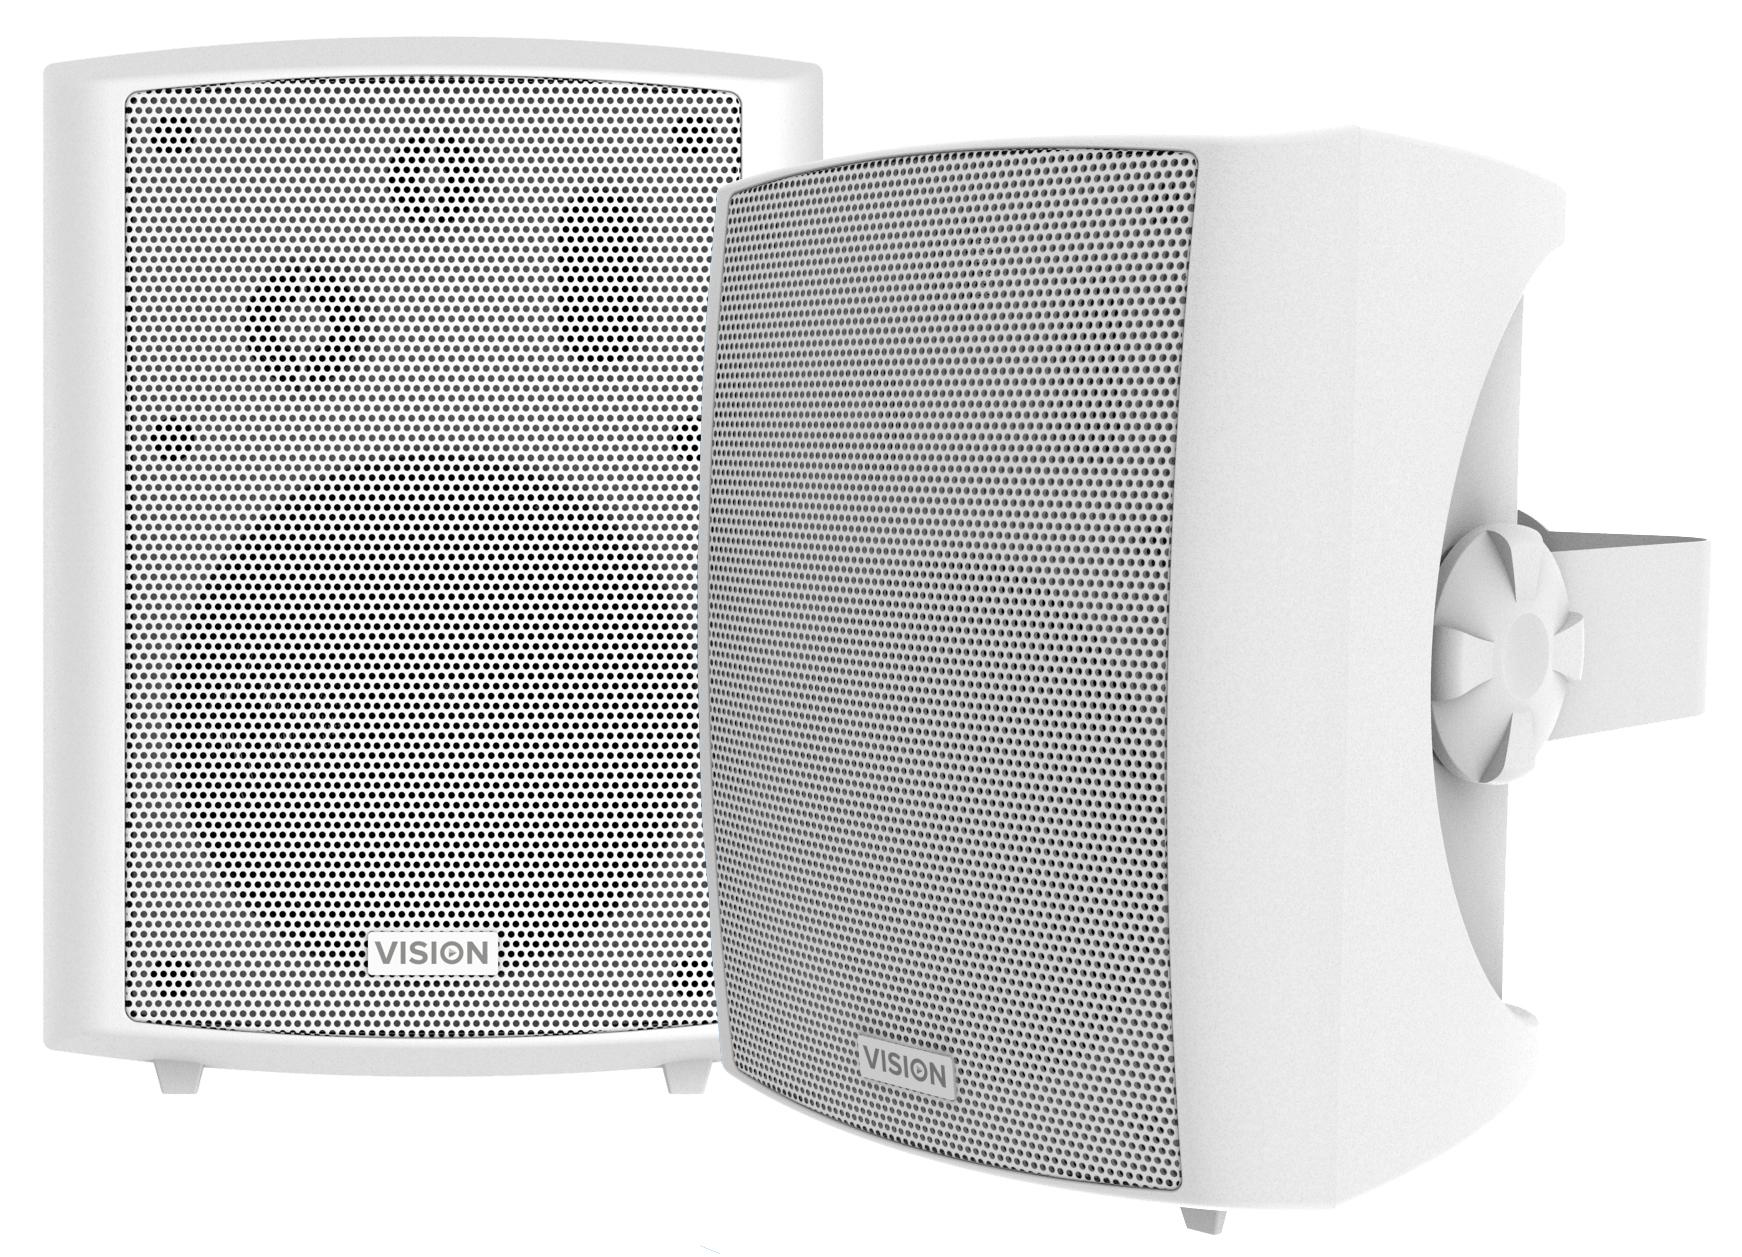 Vision SP-1800 loudspeaker